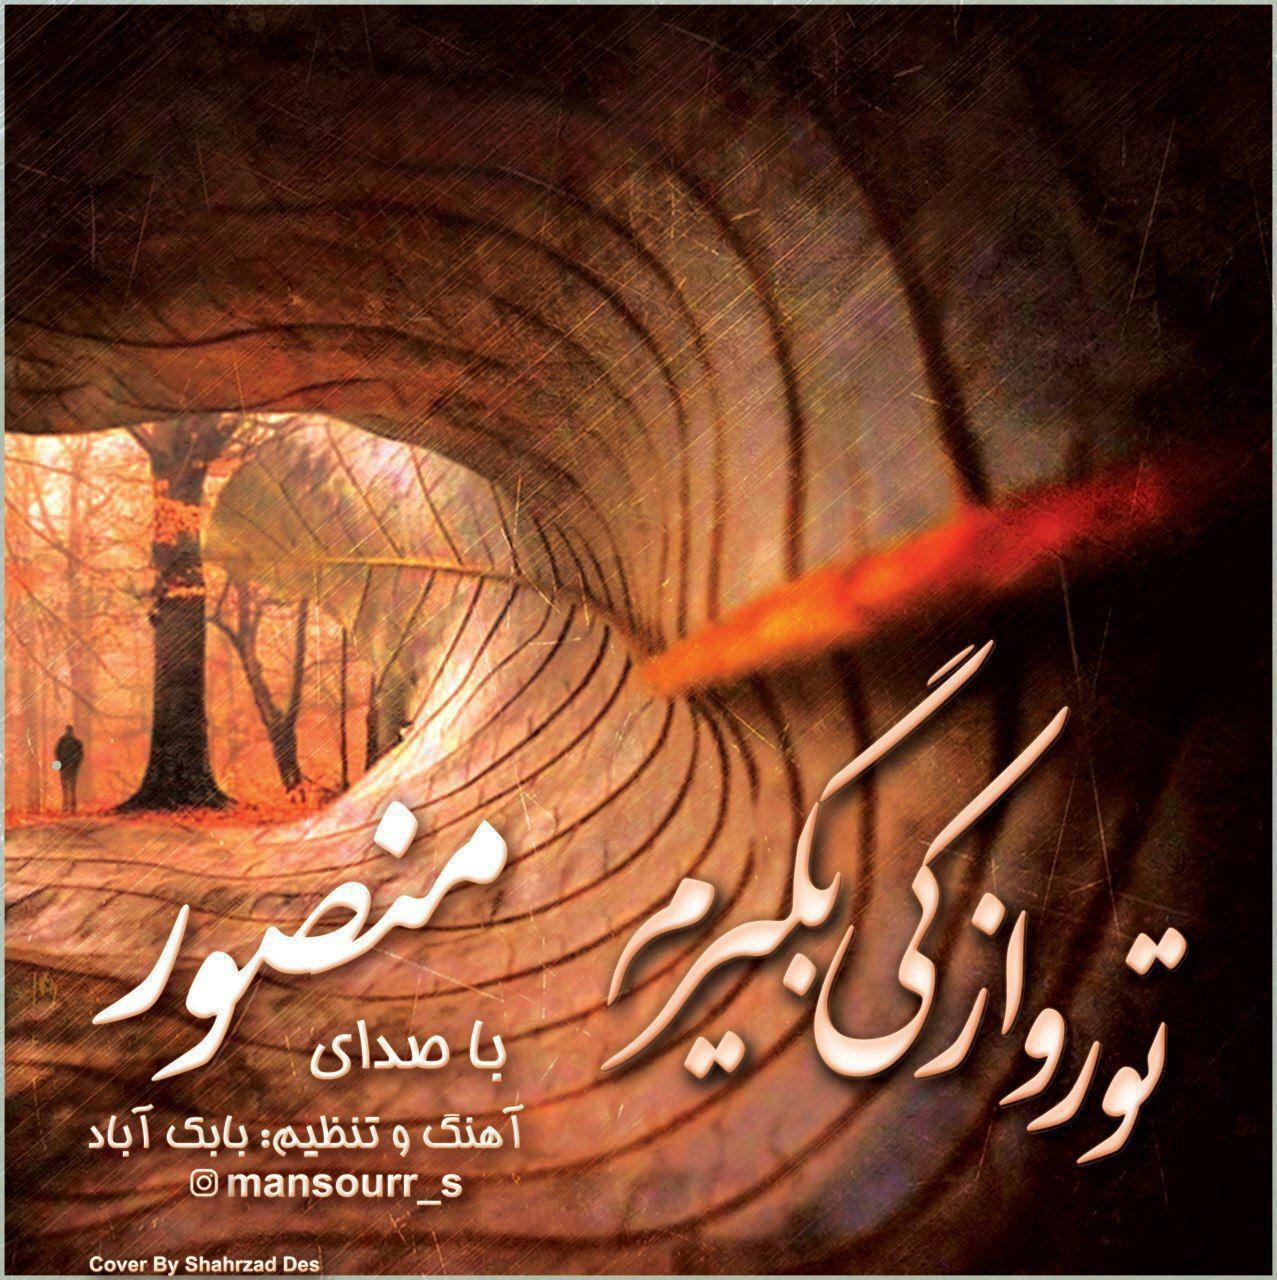 http://dl.rasanejavan.com/rasane/1397/aban97/29/Mansour%20-%20Toro%20Az%20Ki%20Begirm.jpg